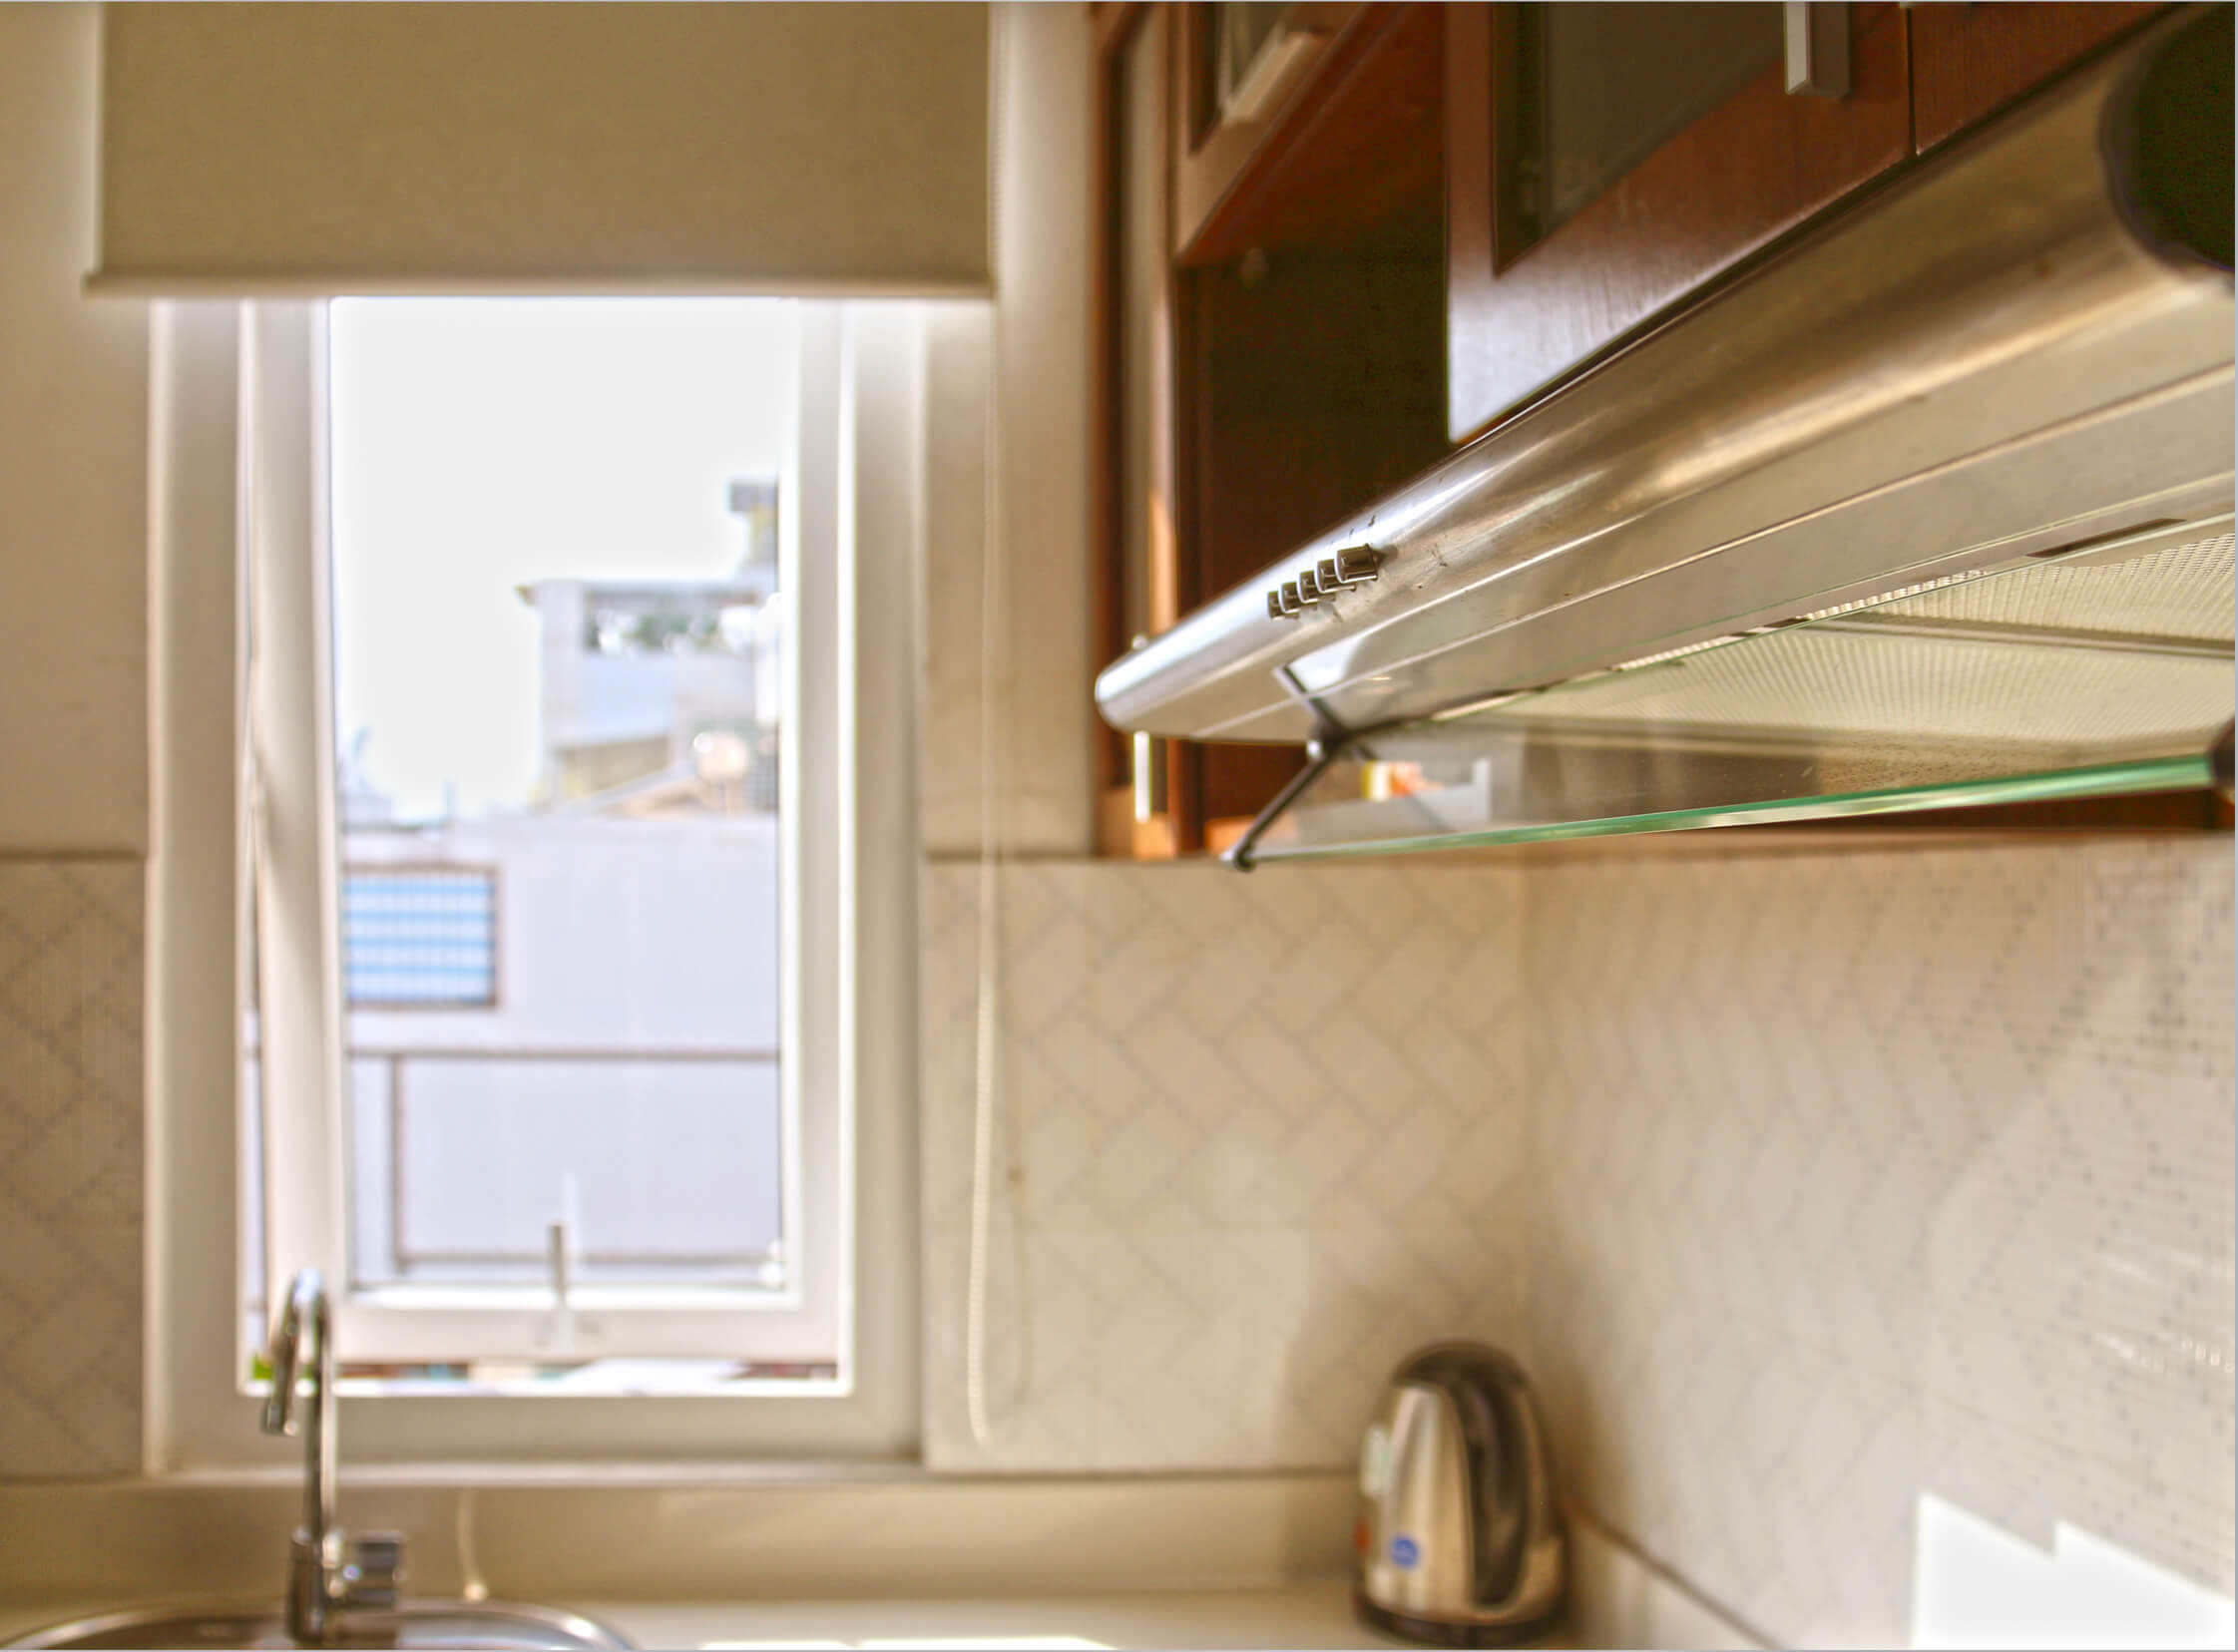 three-oaks-1-serviced-apartment-STUDIO-CITY-VIEW-Floor-1122